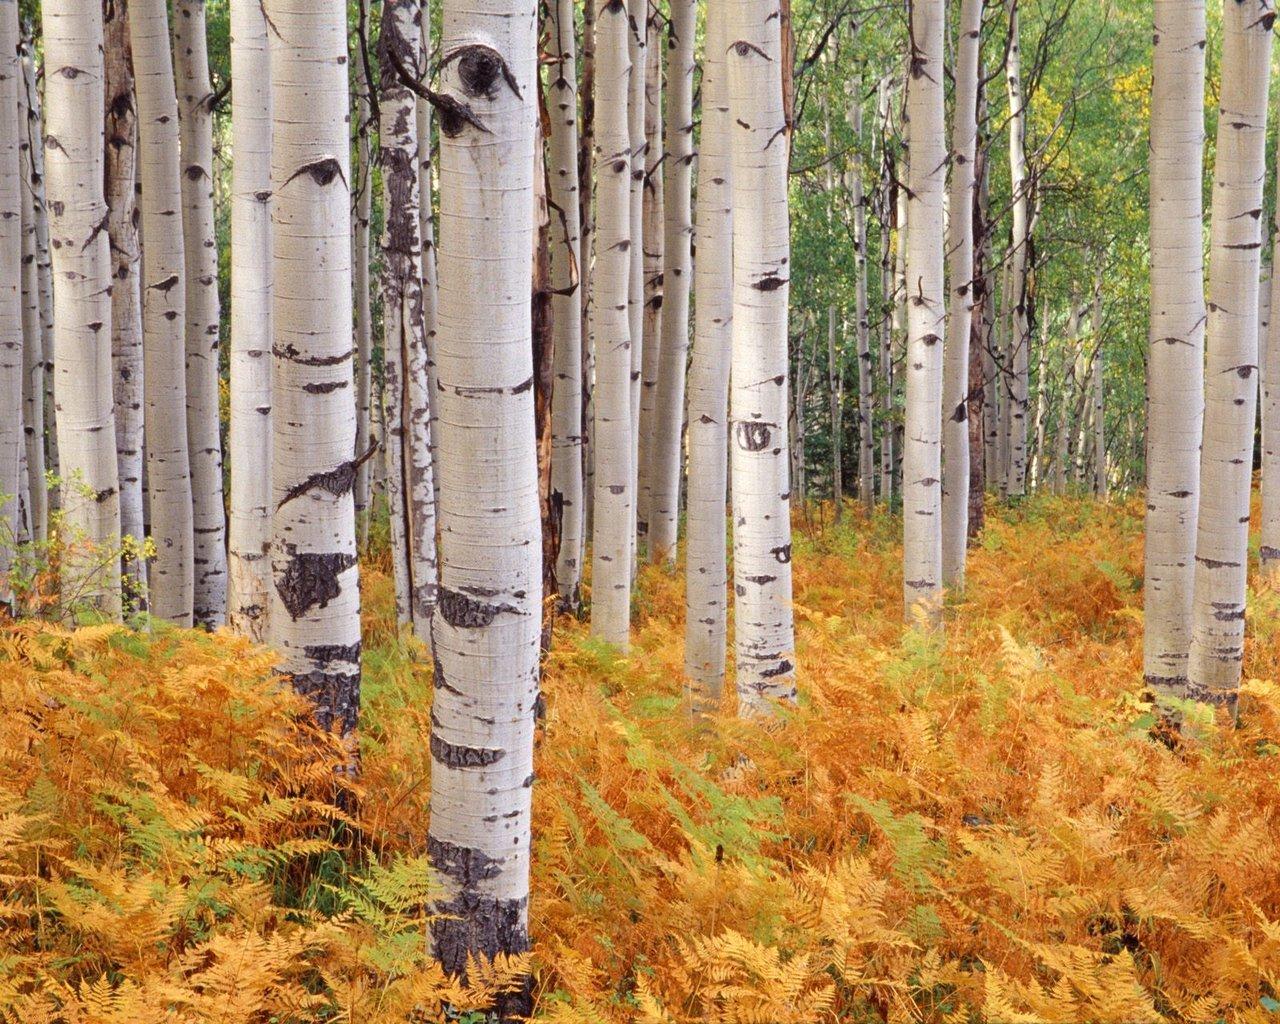 Birch Tree Wallpaper 25326 1280x1024 Px